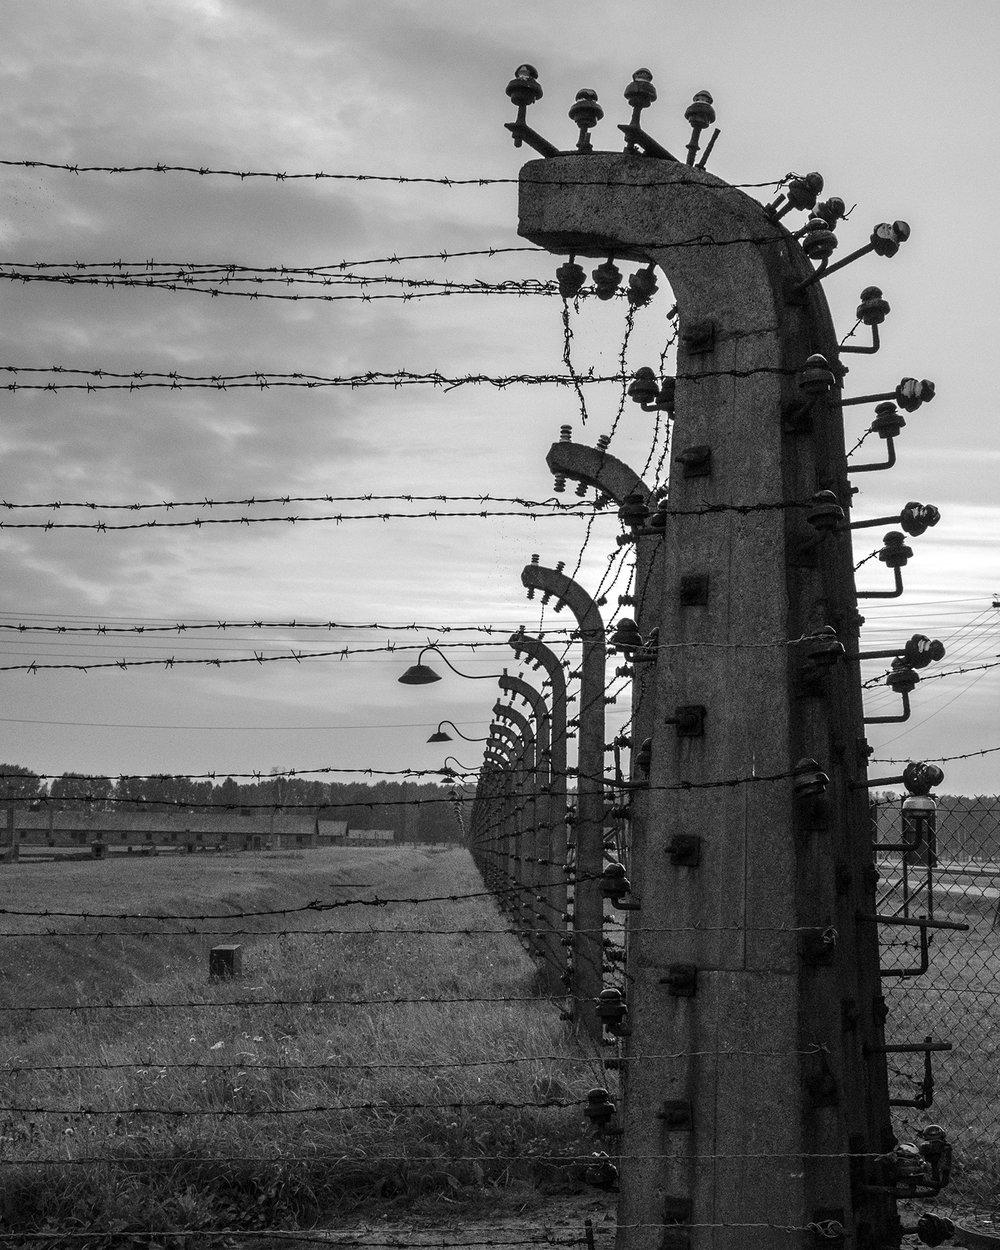 Auschwitz Birkenau-reticolati con isolatori-3236.jpg